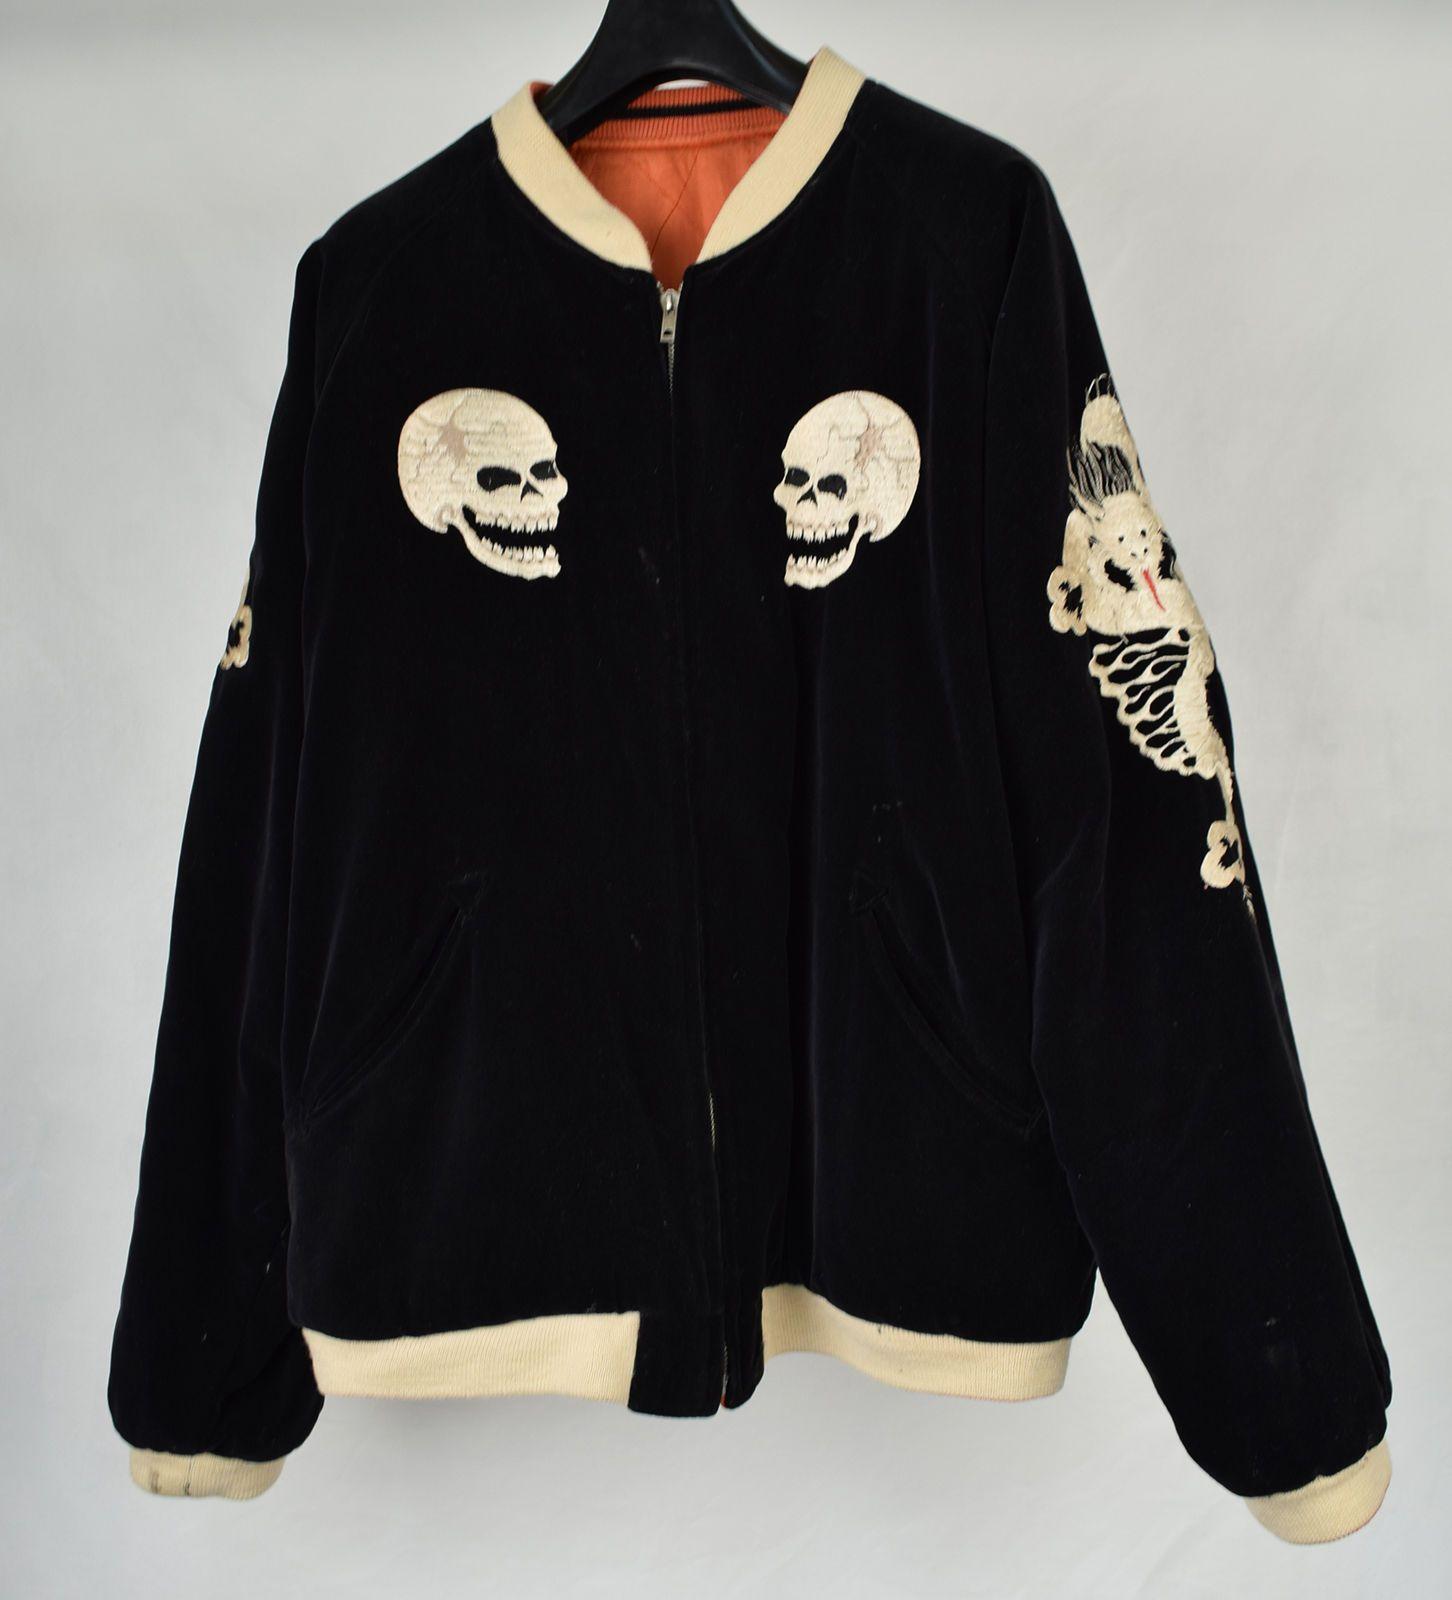 1969 VIETNAM REVERSIBLE SATIN SOUVENIR JACKET   Stuff N Thangs   Pinterest   Satin Clothing And ...